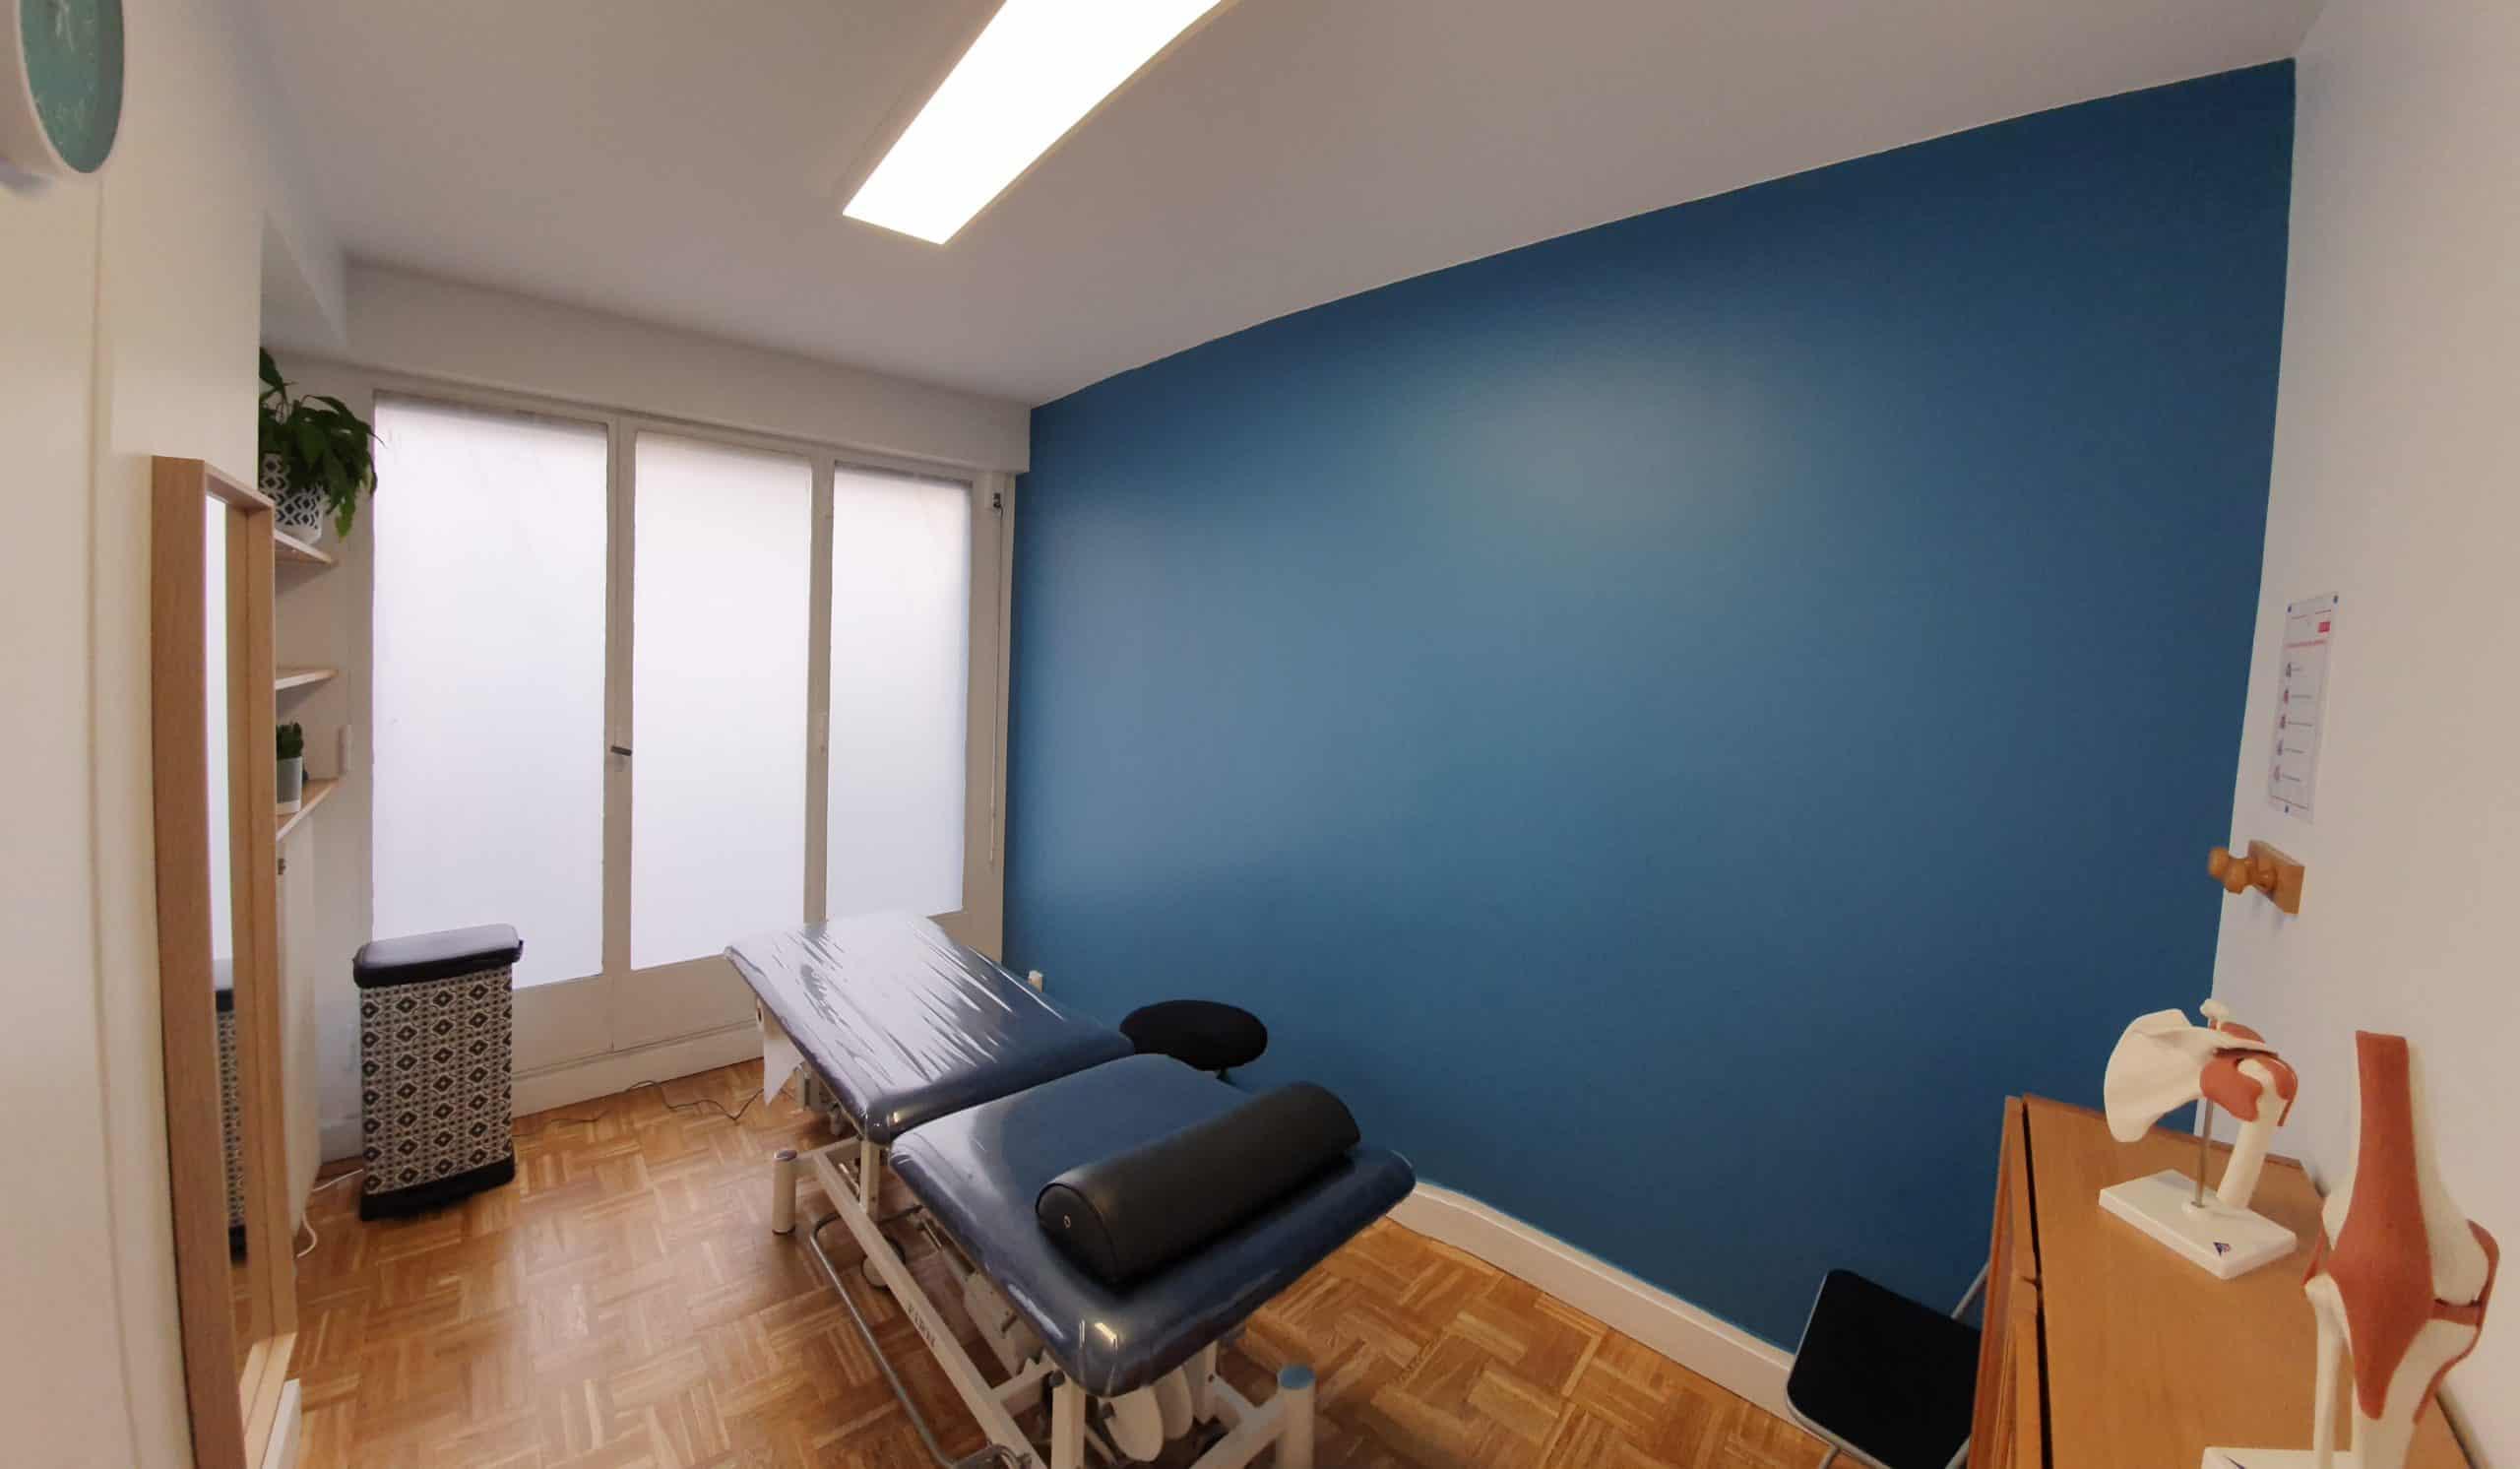 salle consultation osteopathie charenton proche alfortville